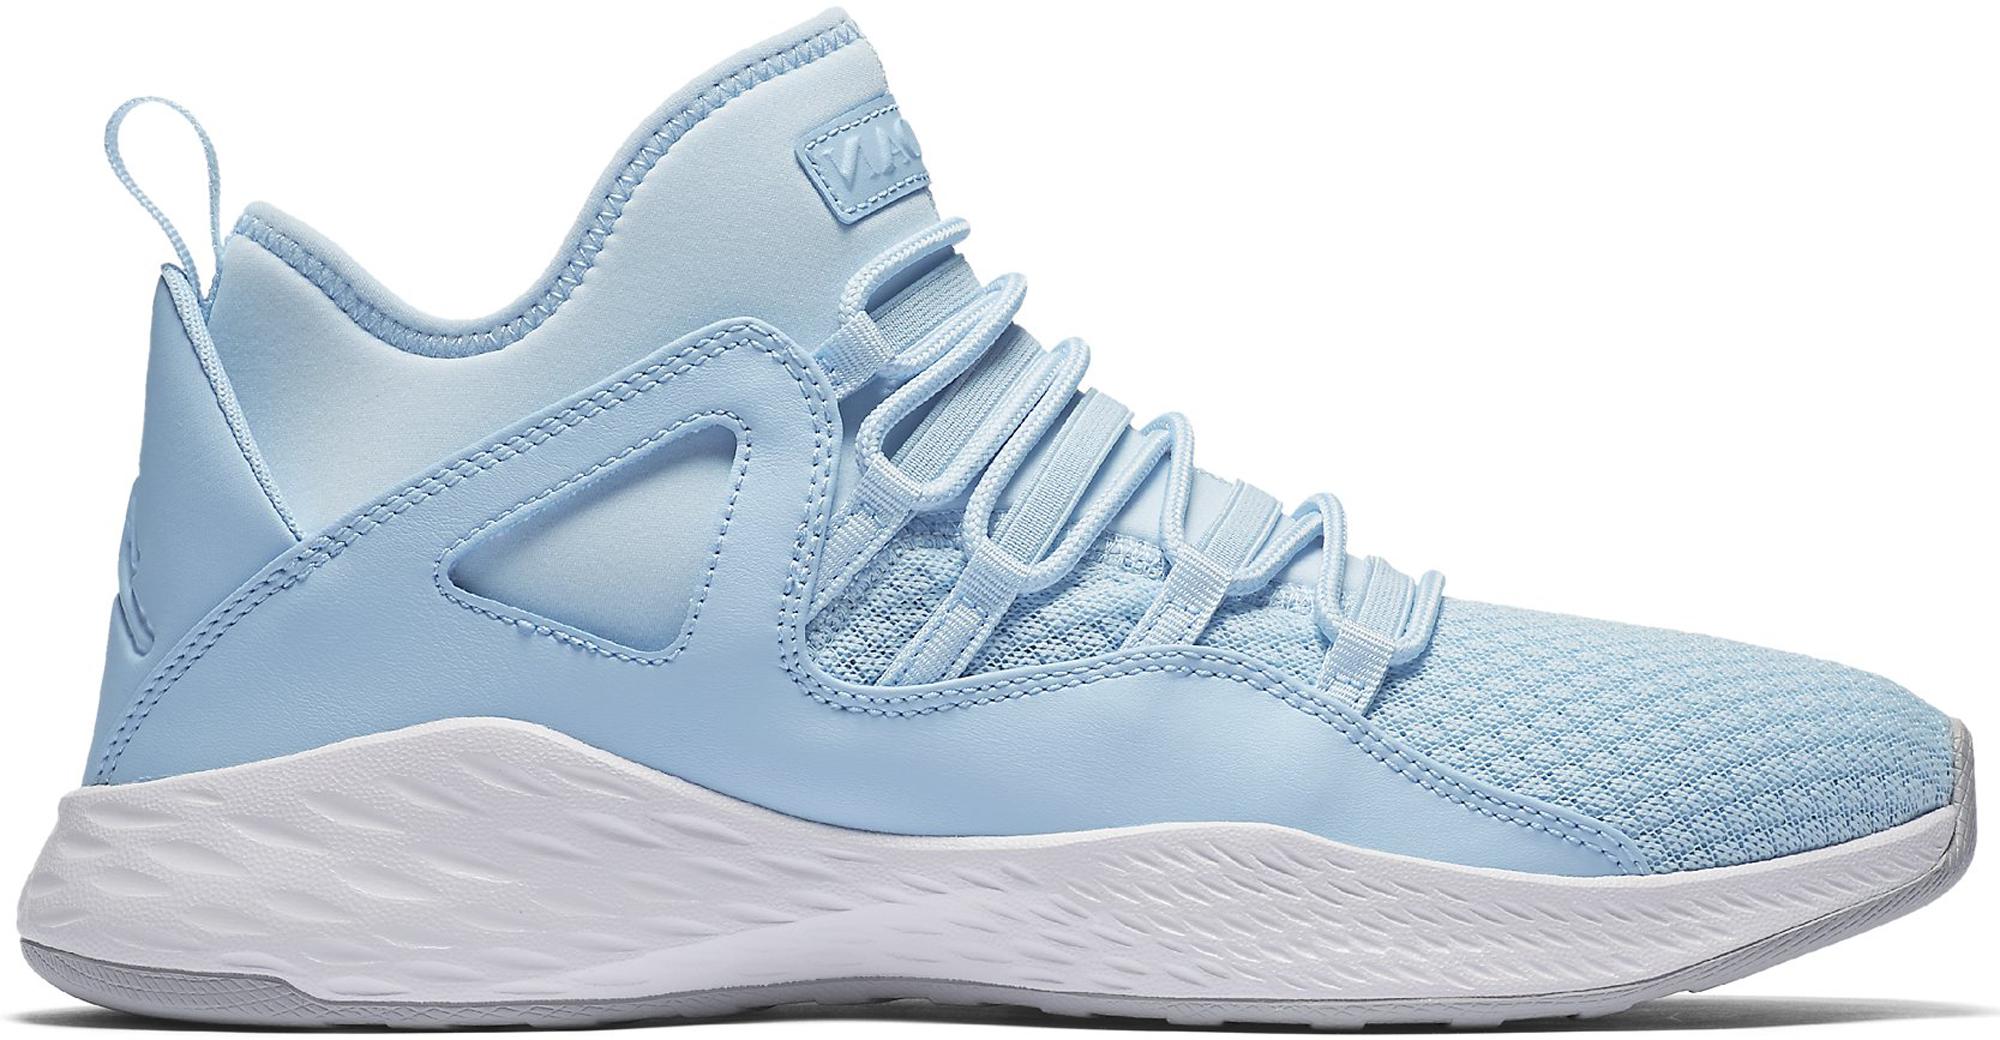 Jordan Formula 23 Ice Blue - 881465-406